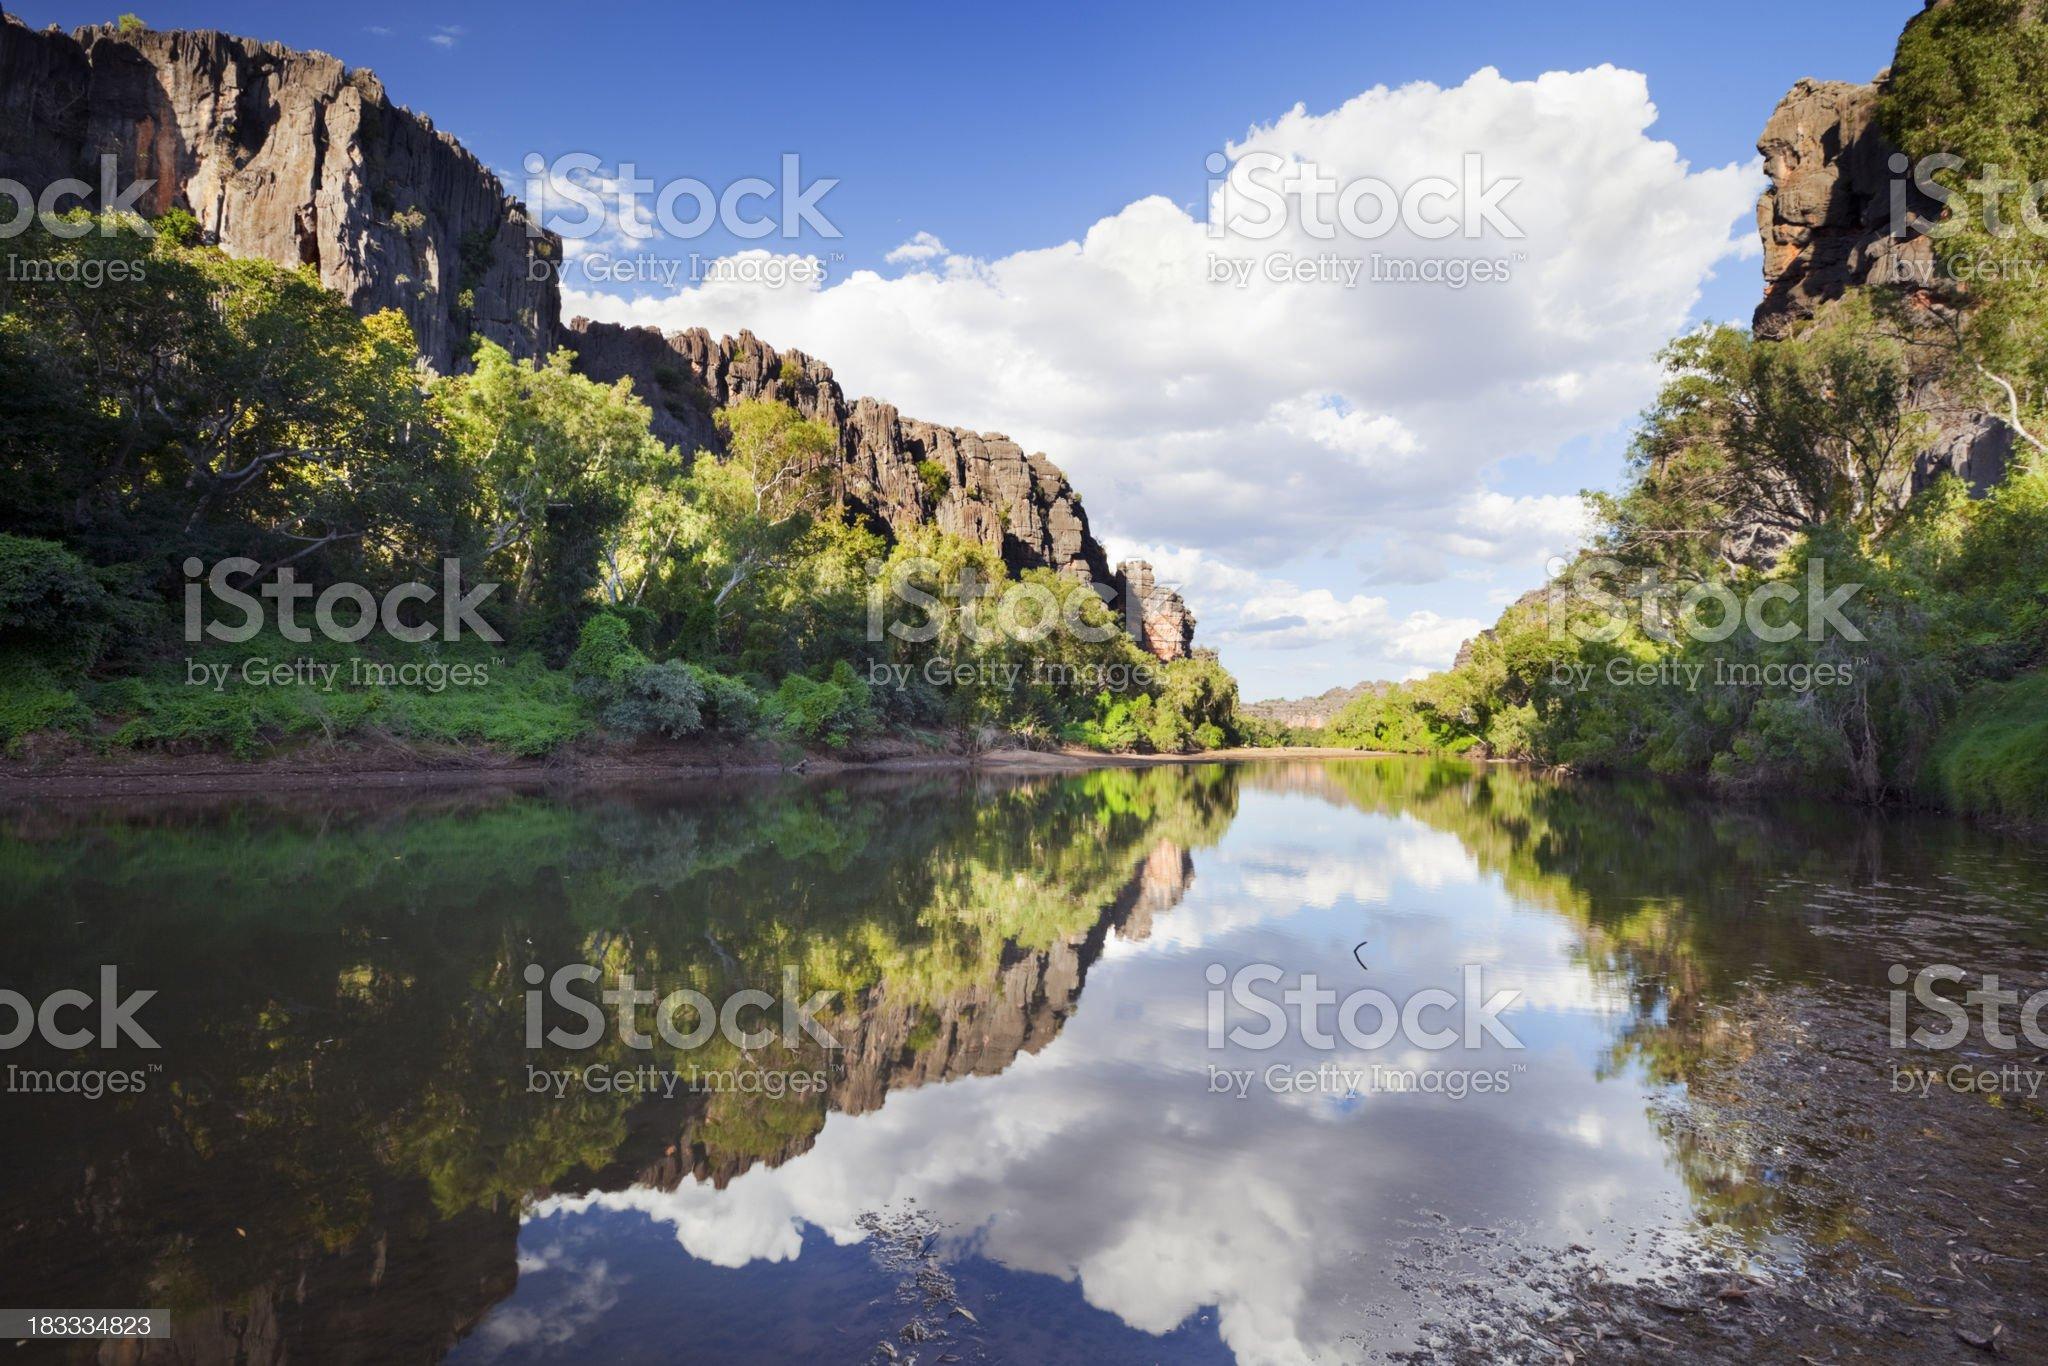 Reflections in Windjana Gorge, Western Australia on a sunny day royalty-free stock photo